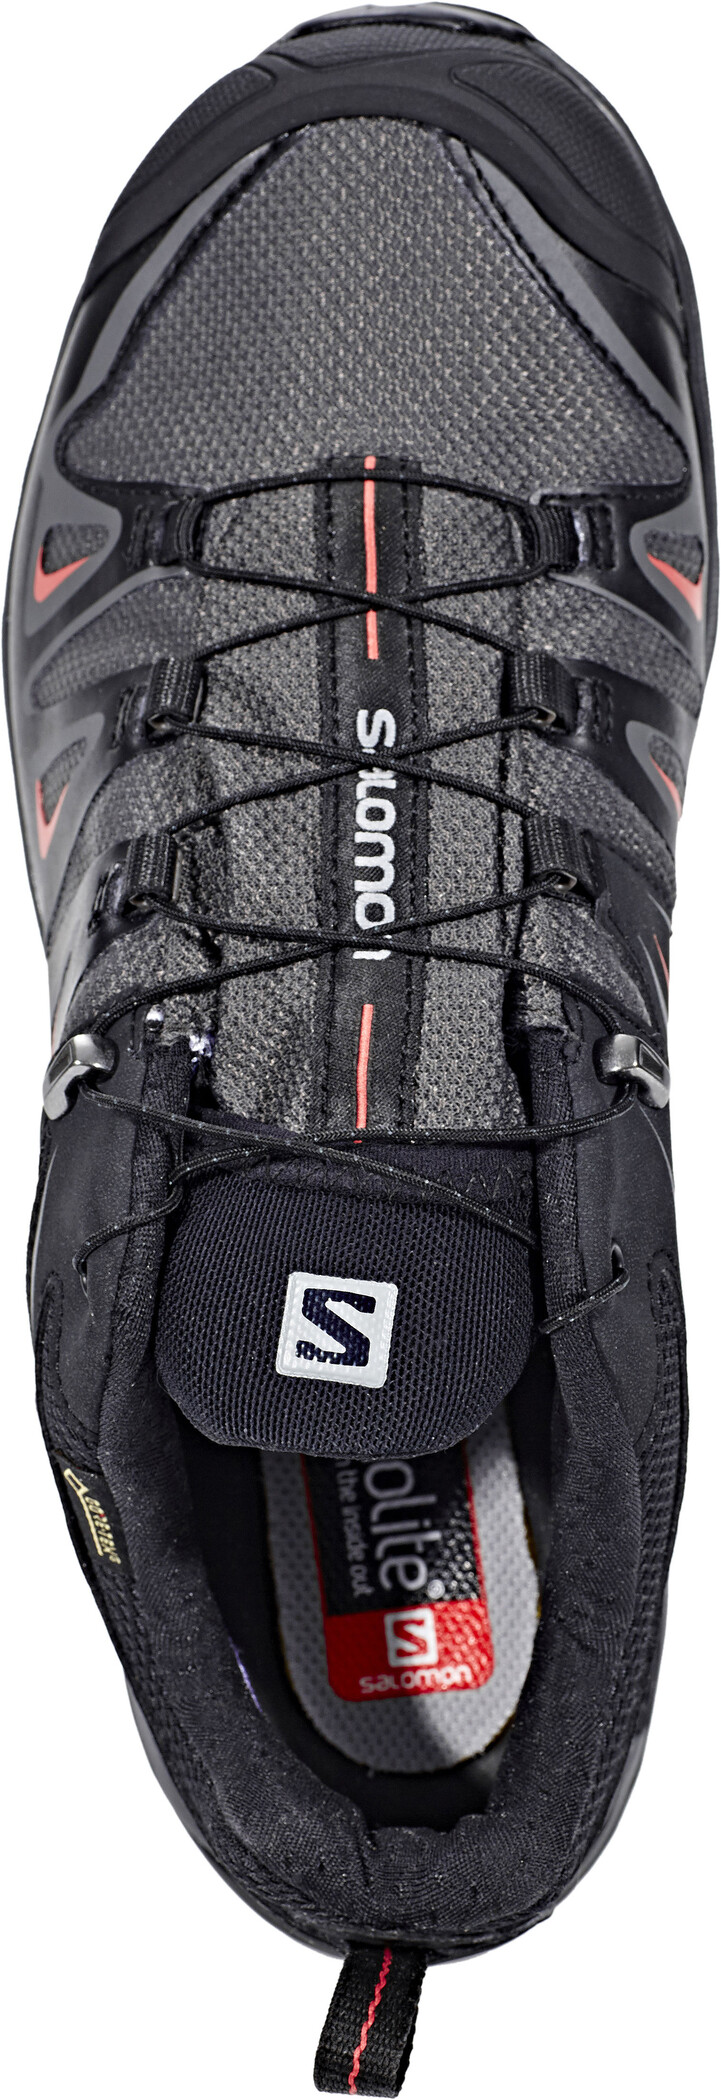 Salomon X Ultra 3 GTX Wanderschuhe Damen magnetblackmineral red 5oe4b